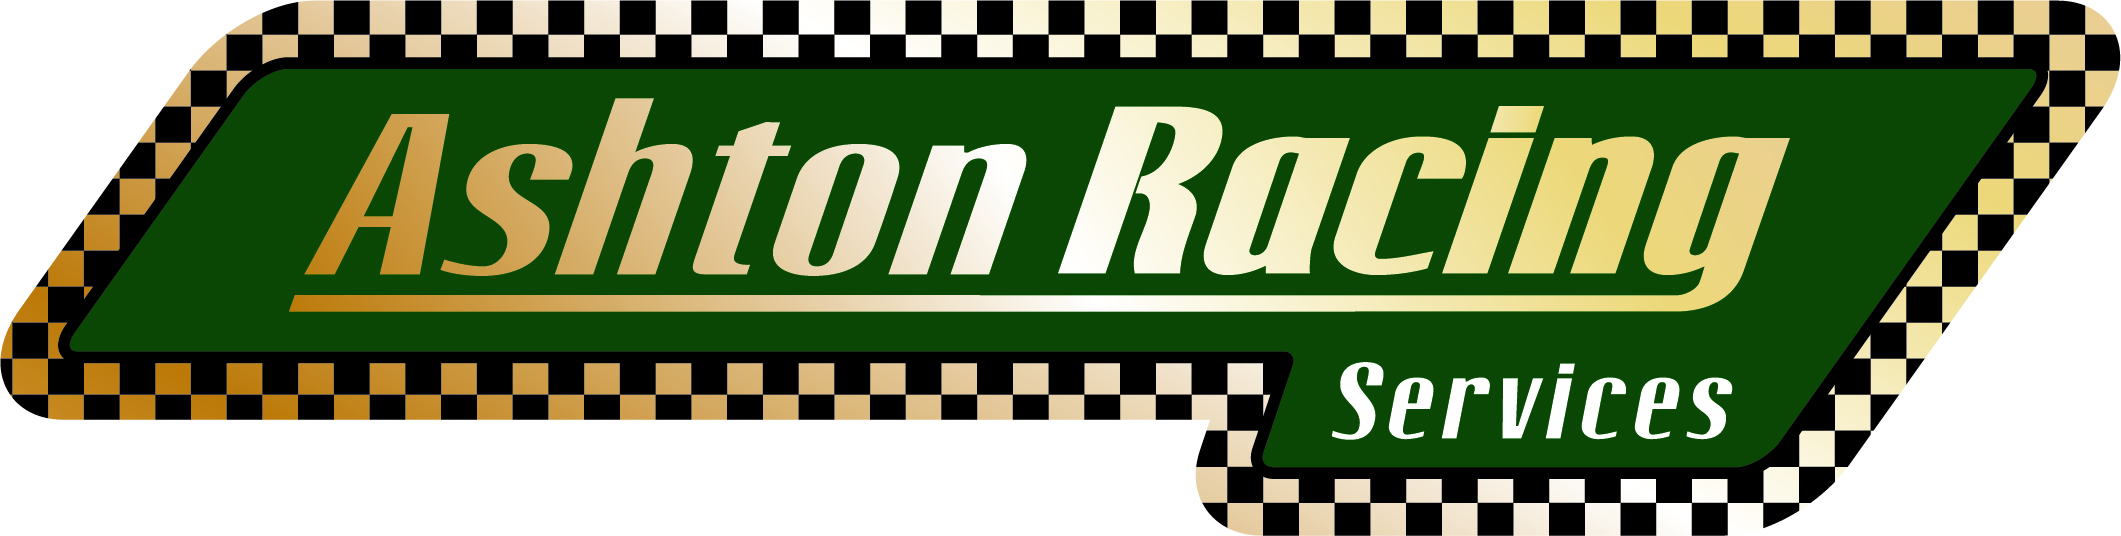 Ashton Racing